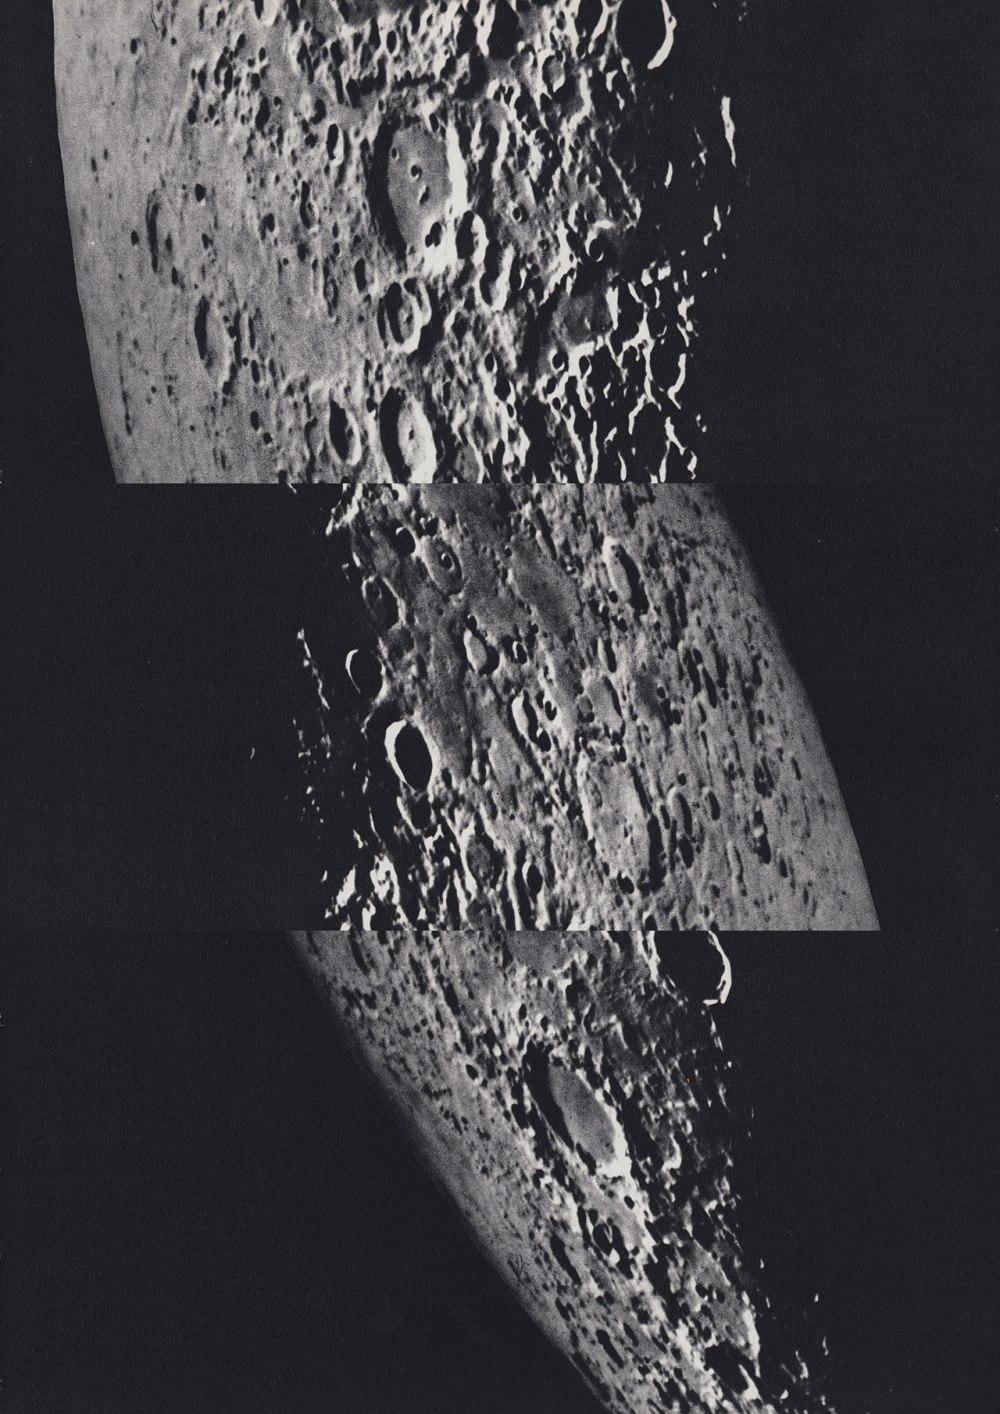 f2_luis_dourado_moons_isolation3_yatzer